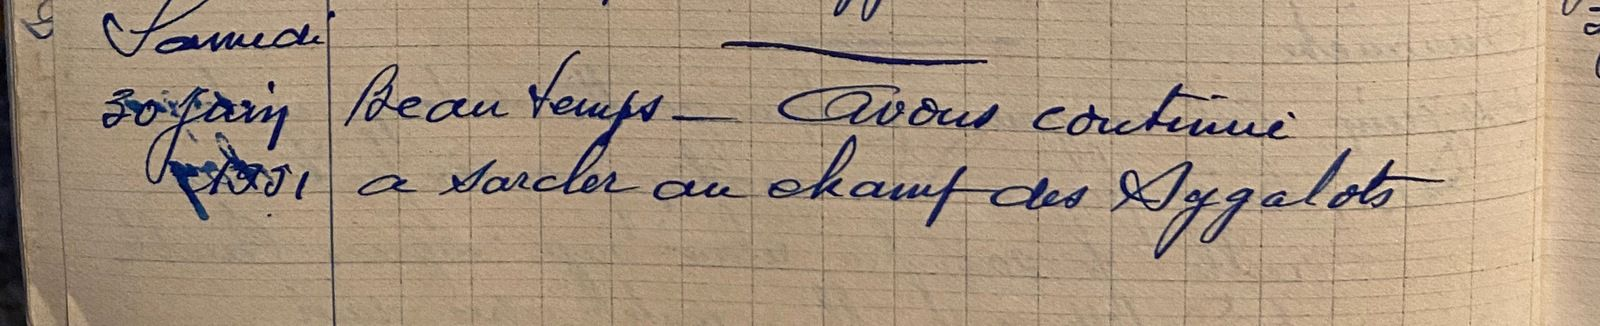 Samedi 30 juin 1951 - continuer à sarcler